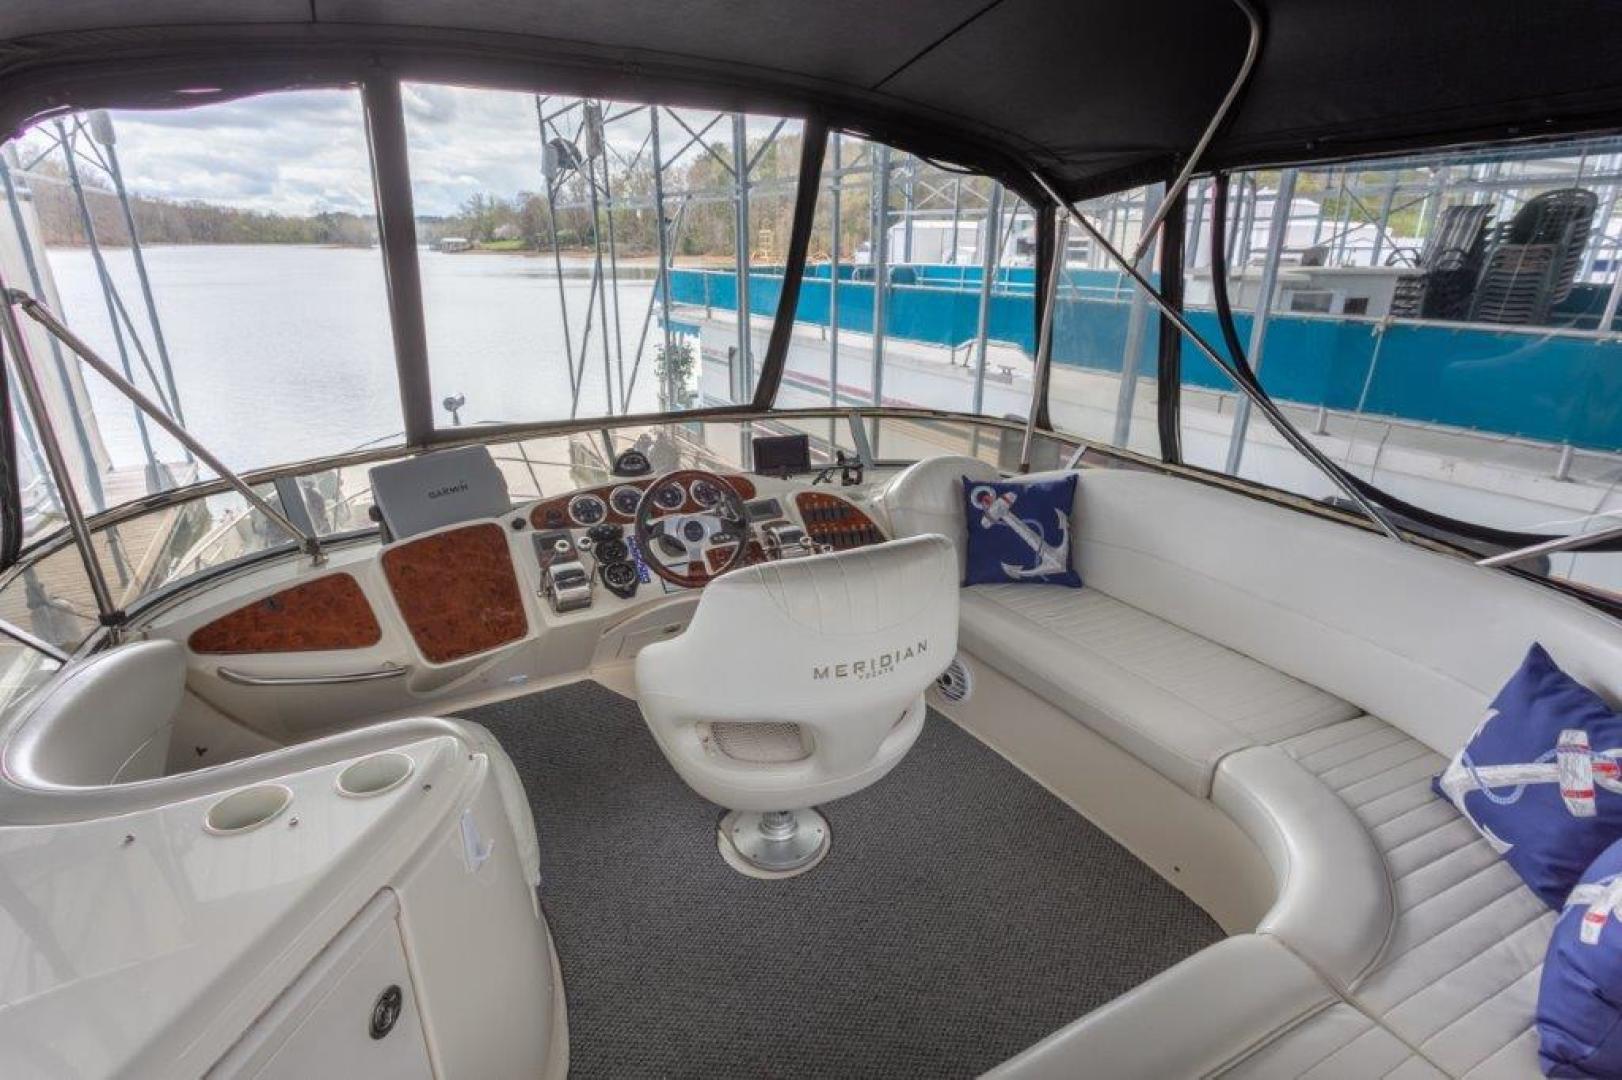 Meridian-459 Motoryacht 2004-Total Pleasure Chattanooga-Tennessee-United States-553073 | Thumbnail